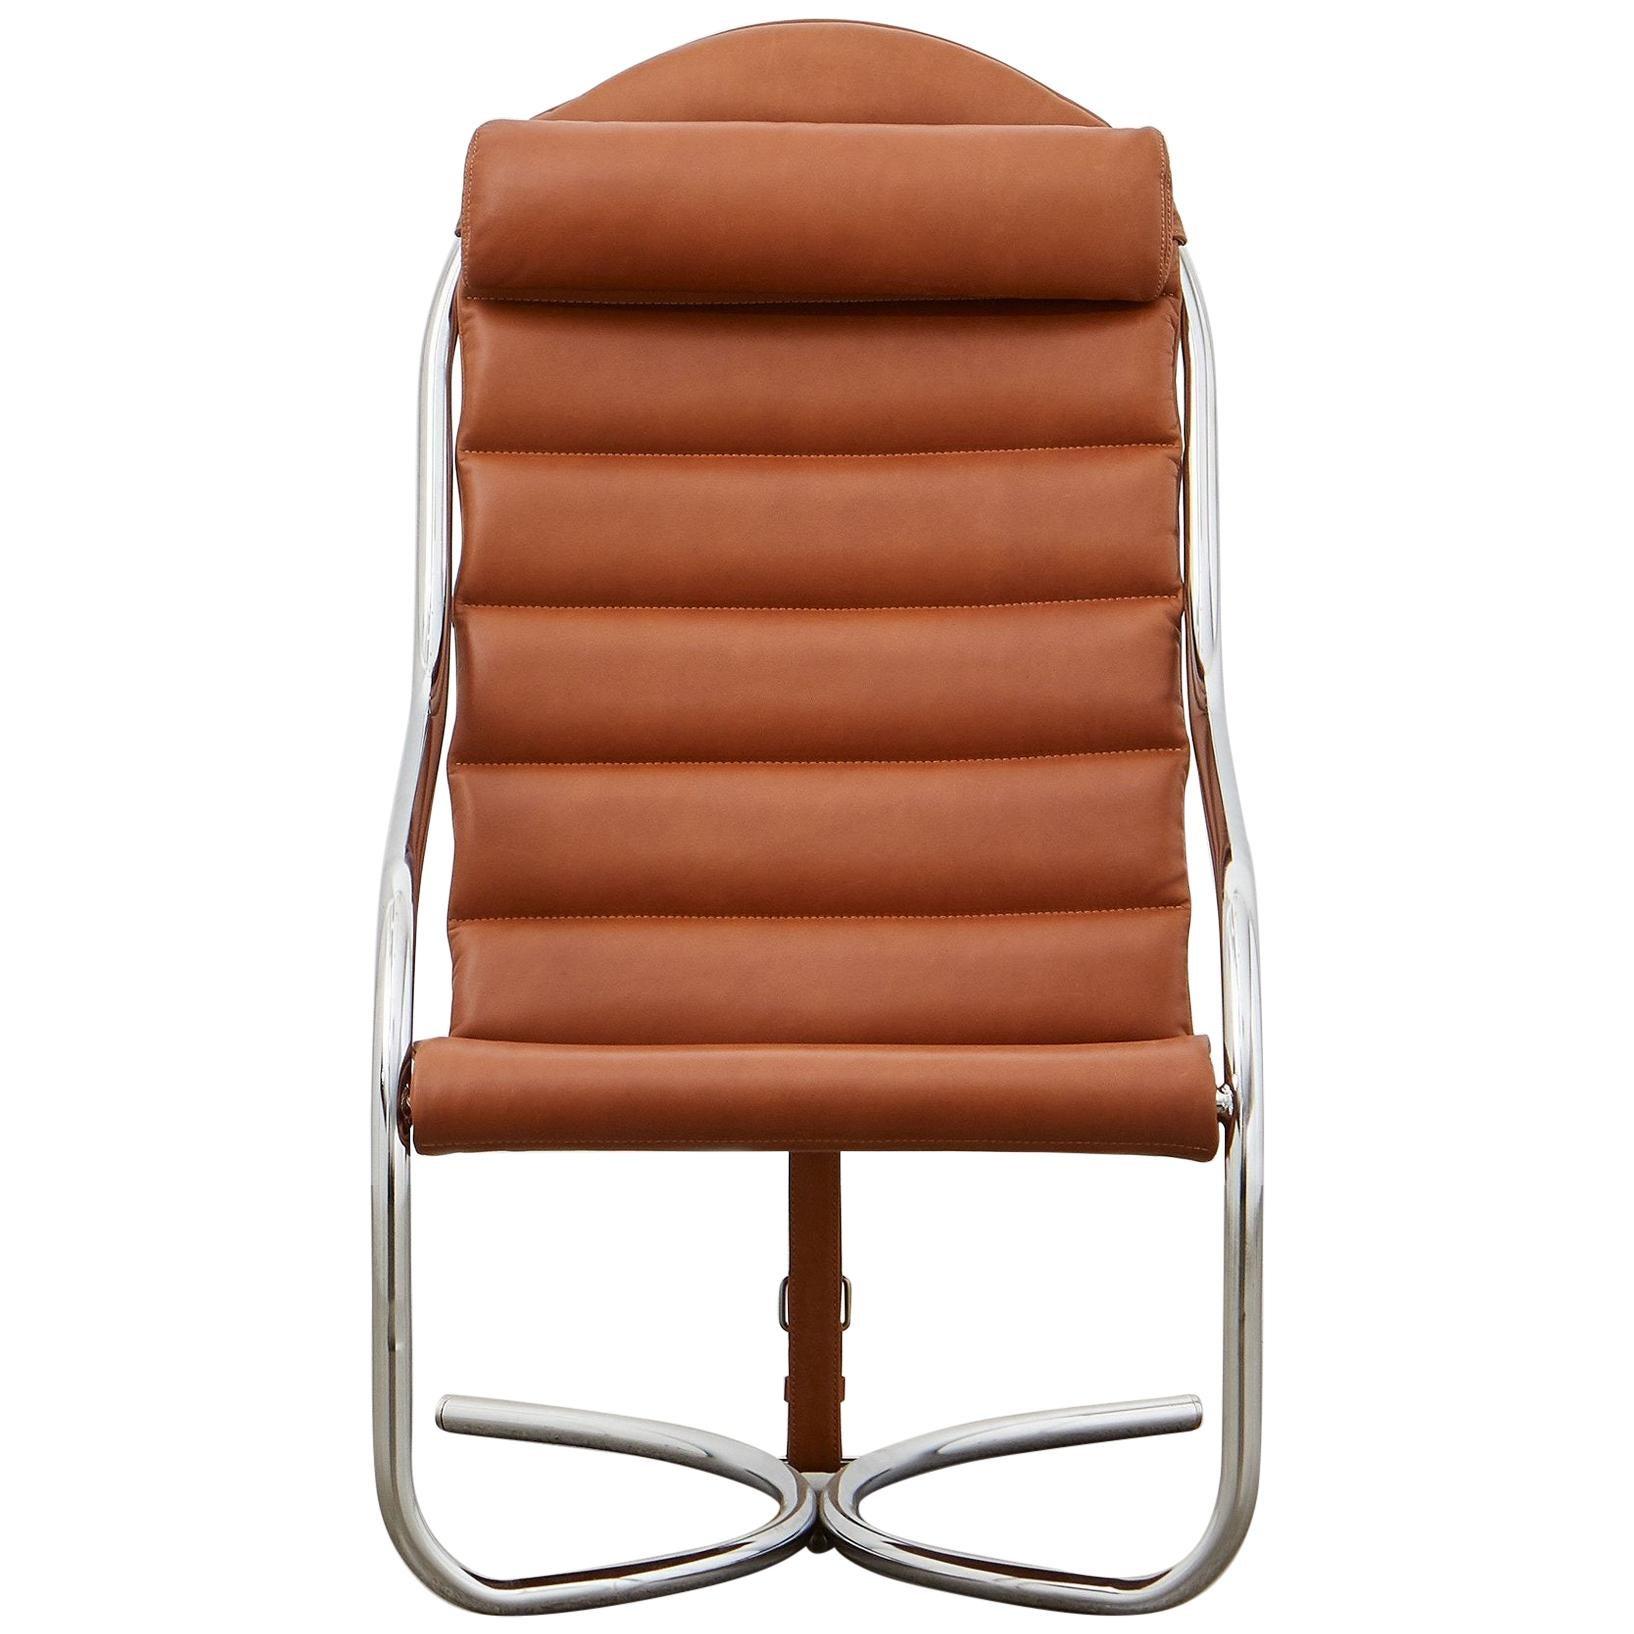 PH Lounge Chair, chrome, leather extreme walnut